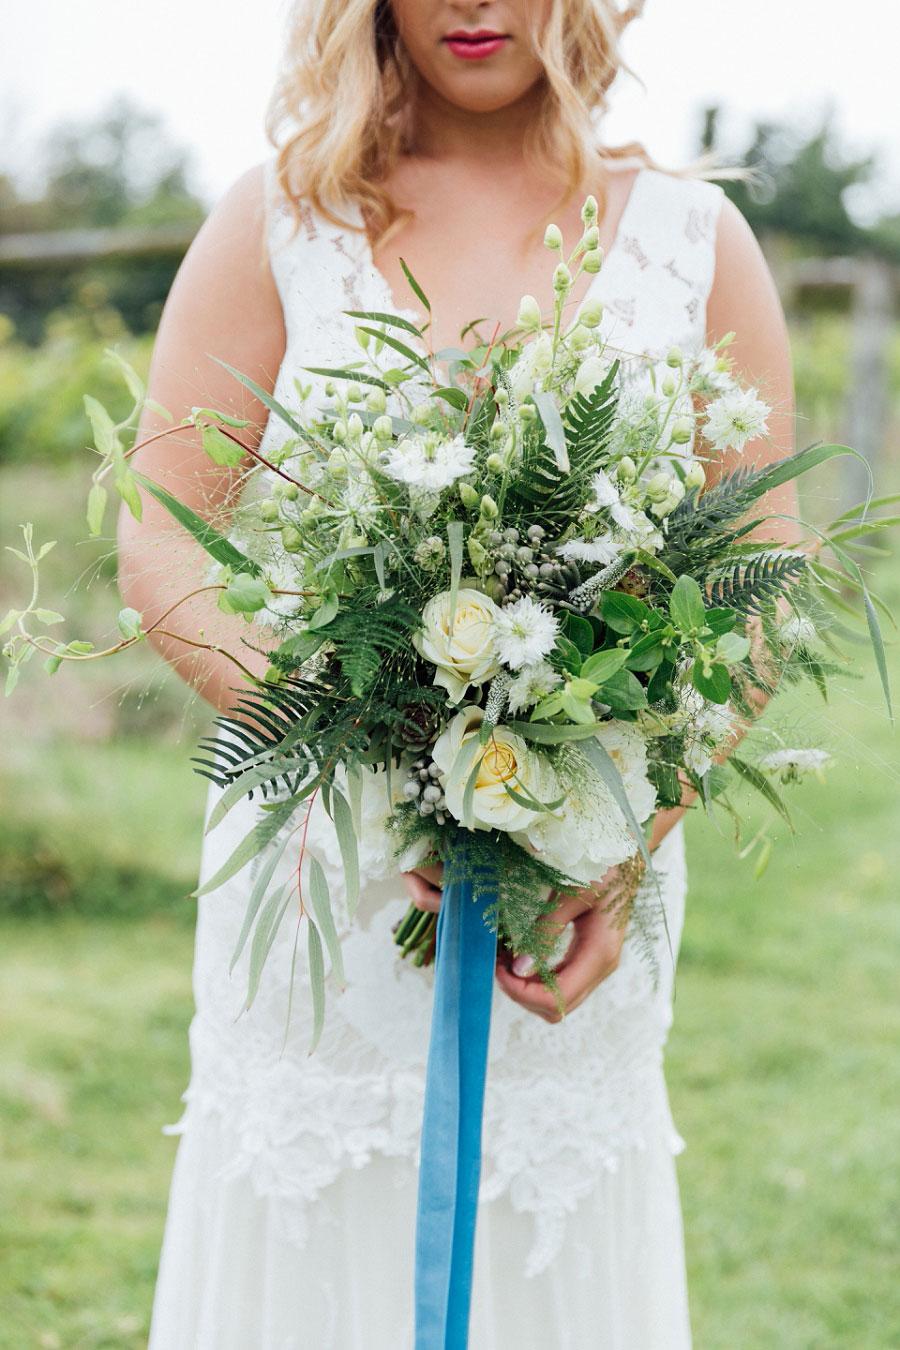 Romantic Vineyard Bridal Shoot With Dusty Blues & Greys0032